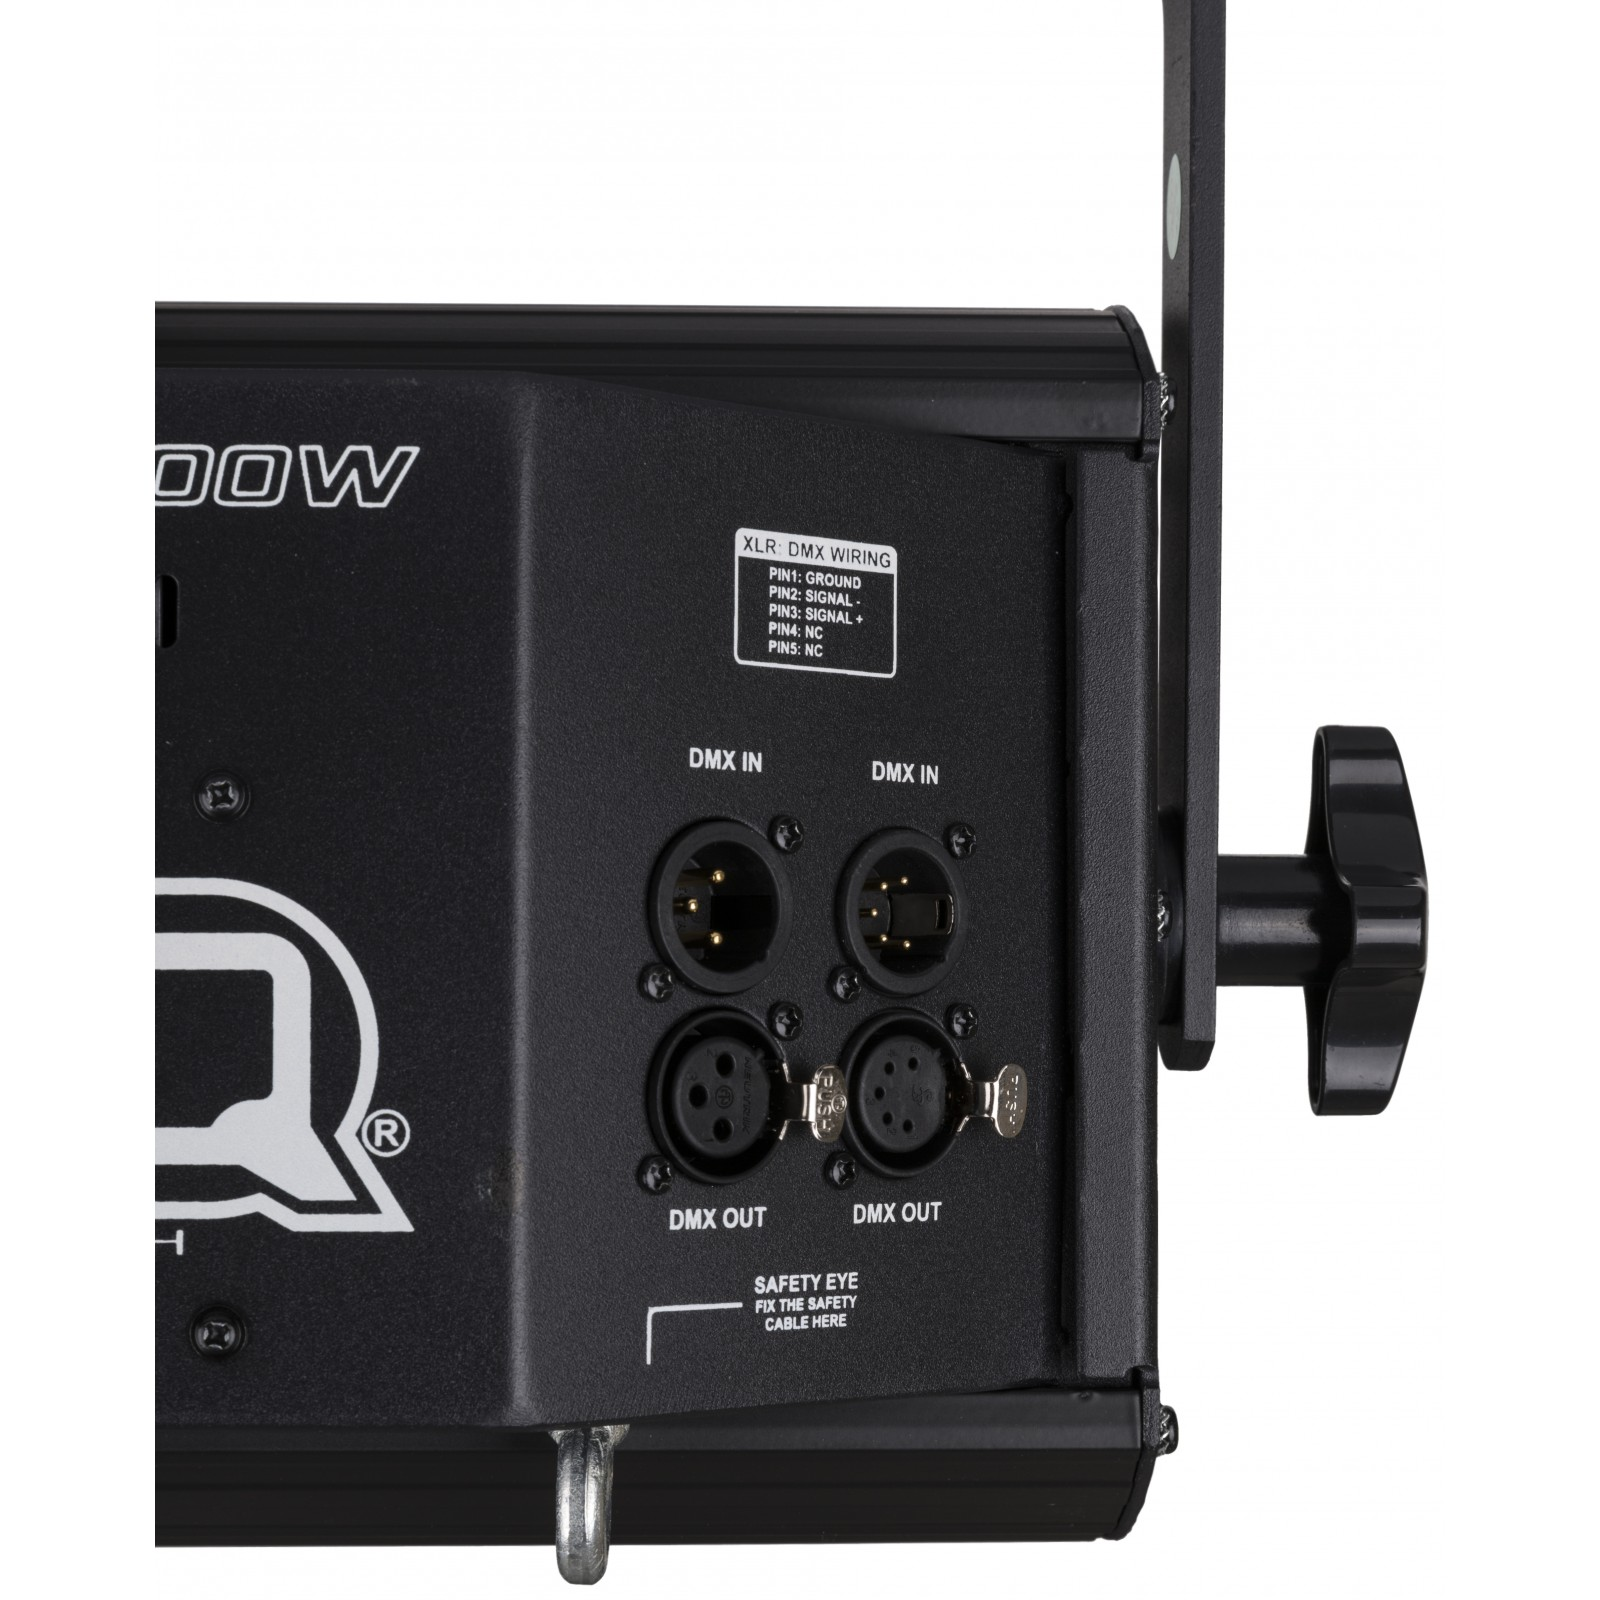 Briteq Cob Blinder 2x100w Stroboskope Dmx Xlr Wiring Diagram B2 Detail Back